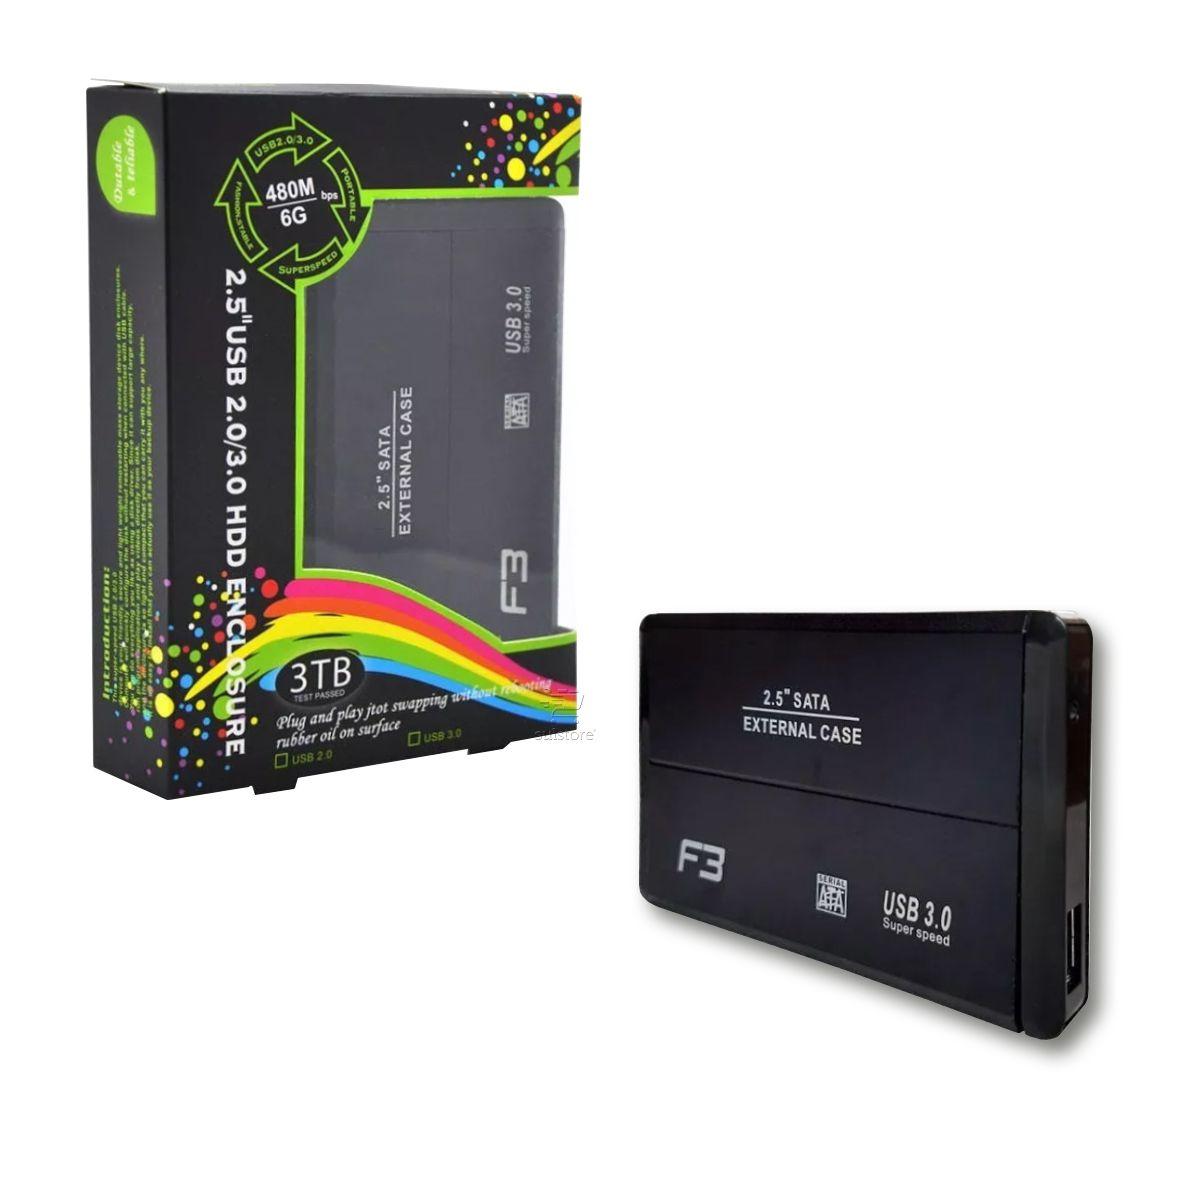 Case Gaveta USB 3.0 6gbps Sata Para HD Notebook Até 4TB 2,5 F3